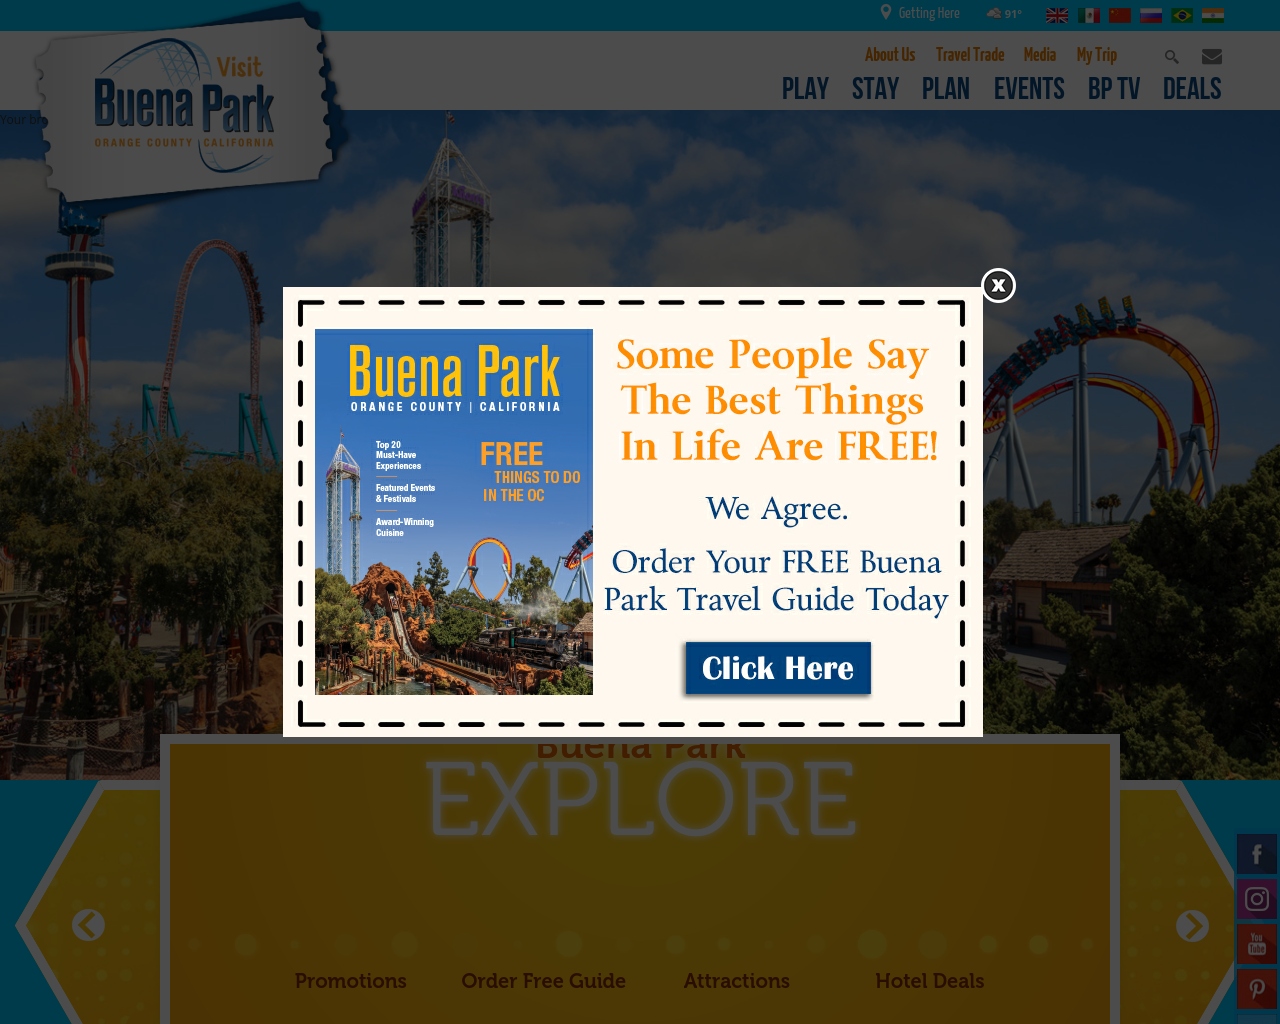 Visit-Buena-Park-Advertising-Reviews-Pricing